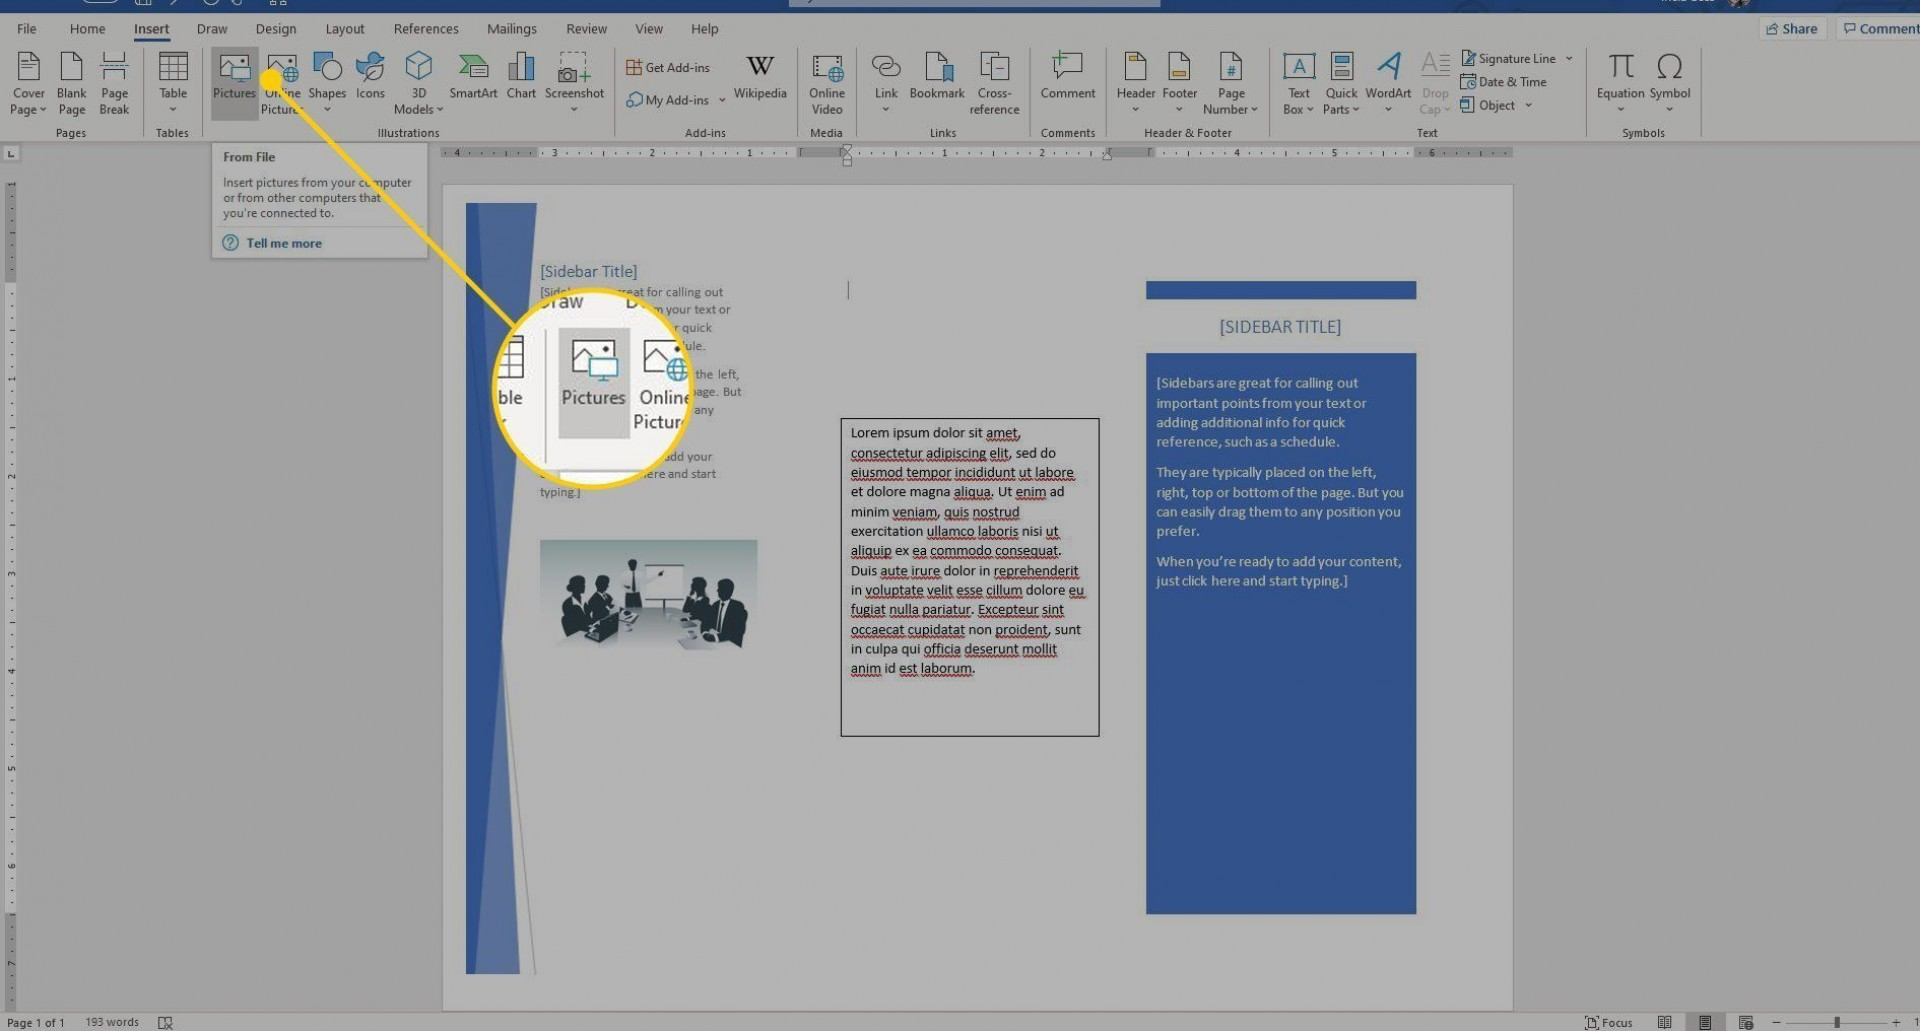 001 Singular Format Brochure Word 2007 Image 1920